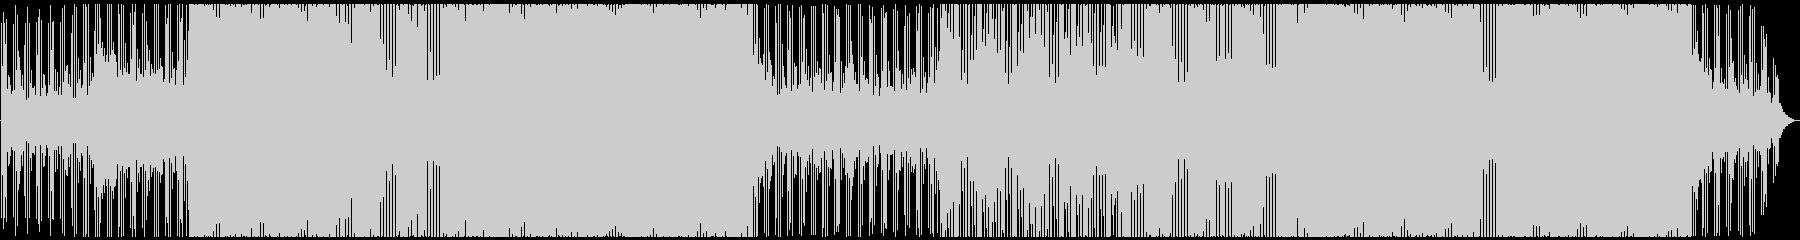 Club / Hard House / Hard Techno's unreproduced waveform